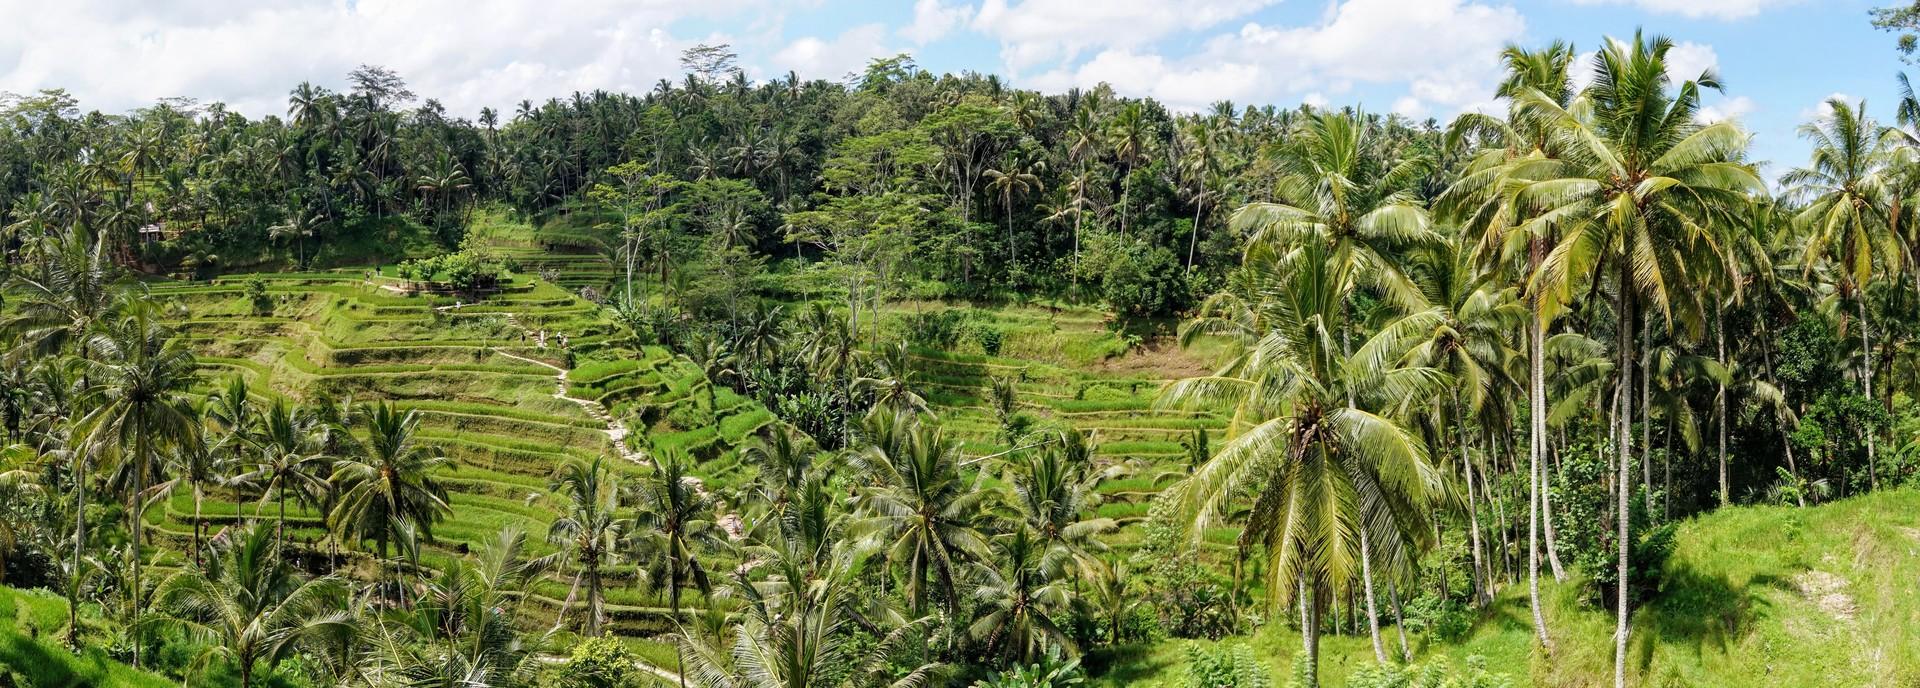 Island Hopping in Indonesia